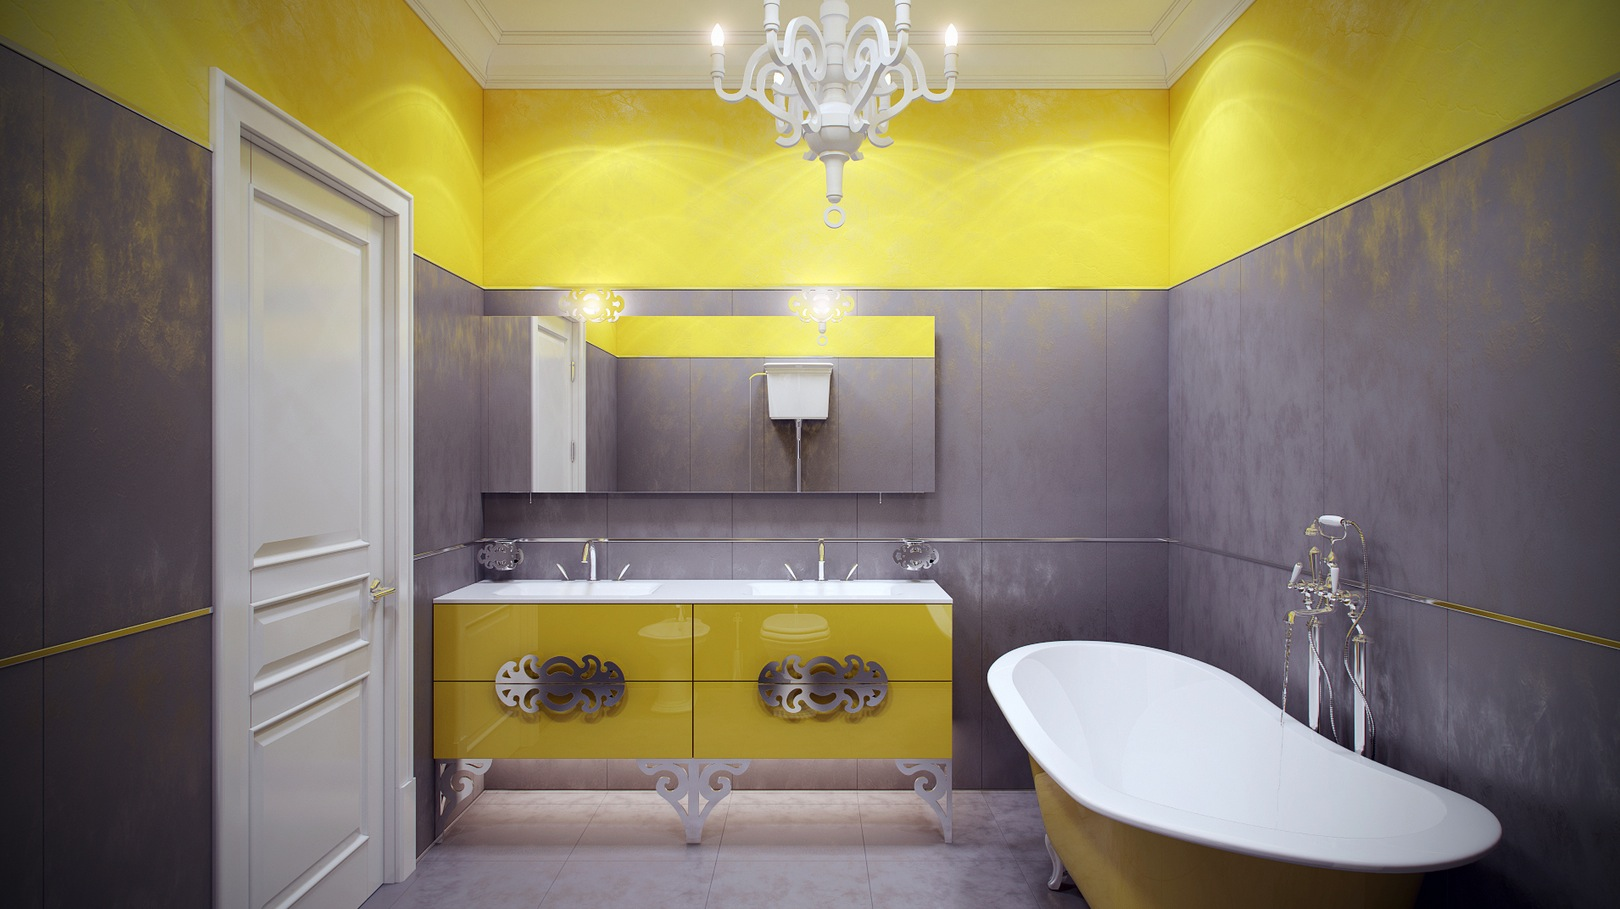 yellow and grey bathroom ideas bathroom ideas perfect yellow and